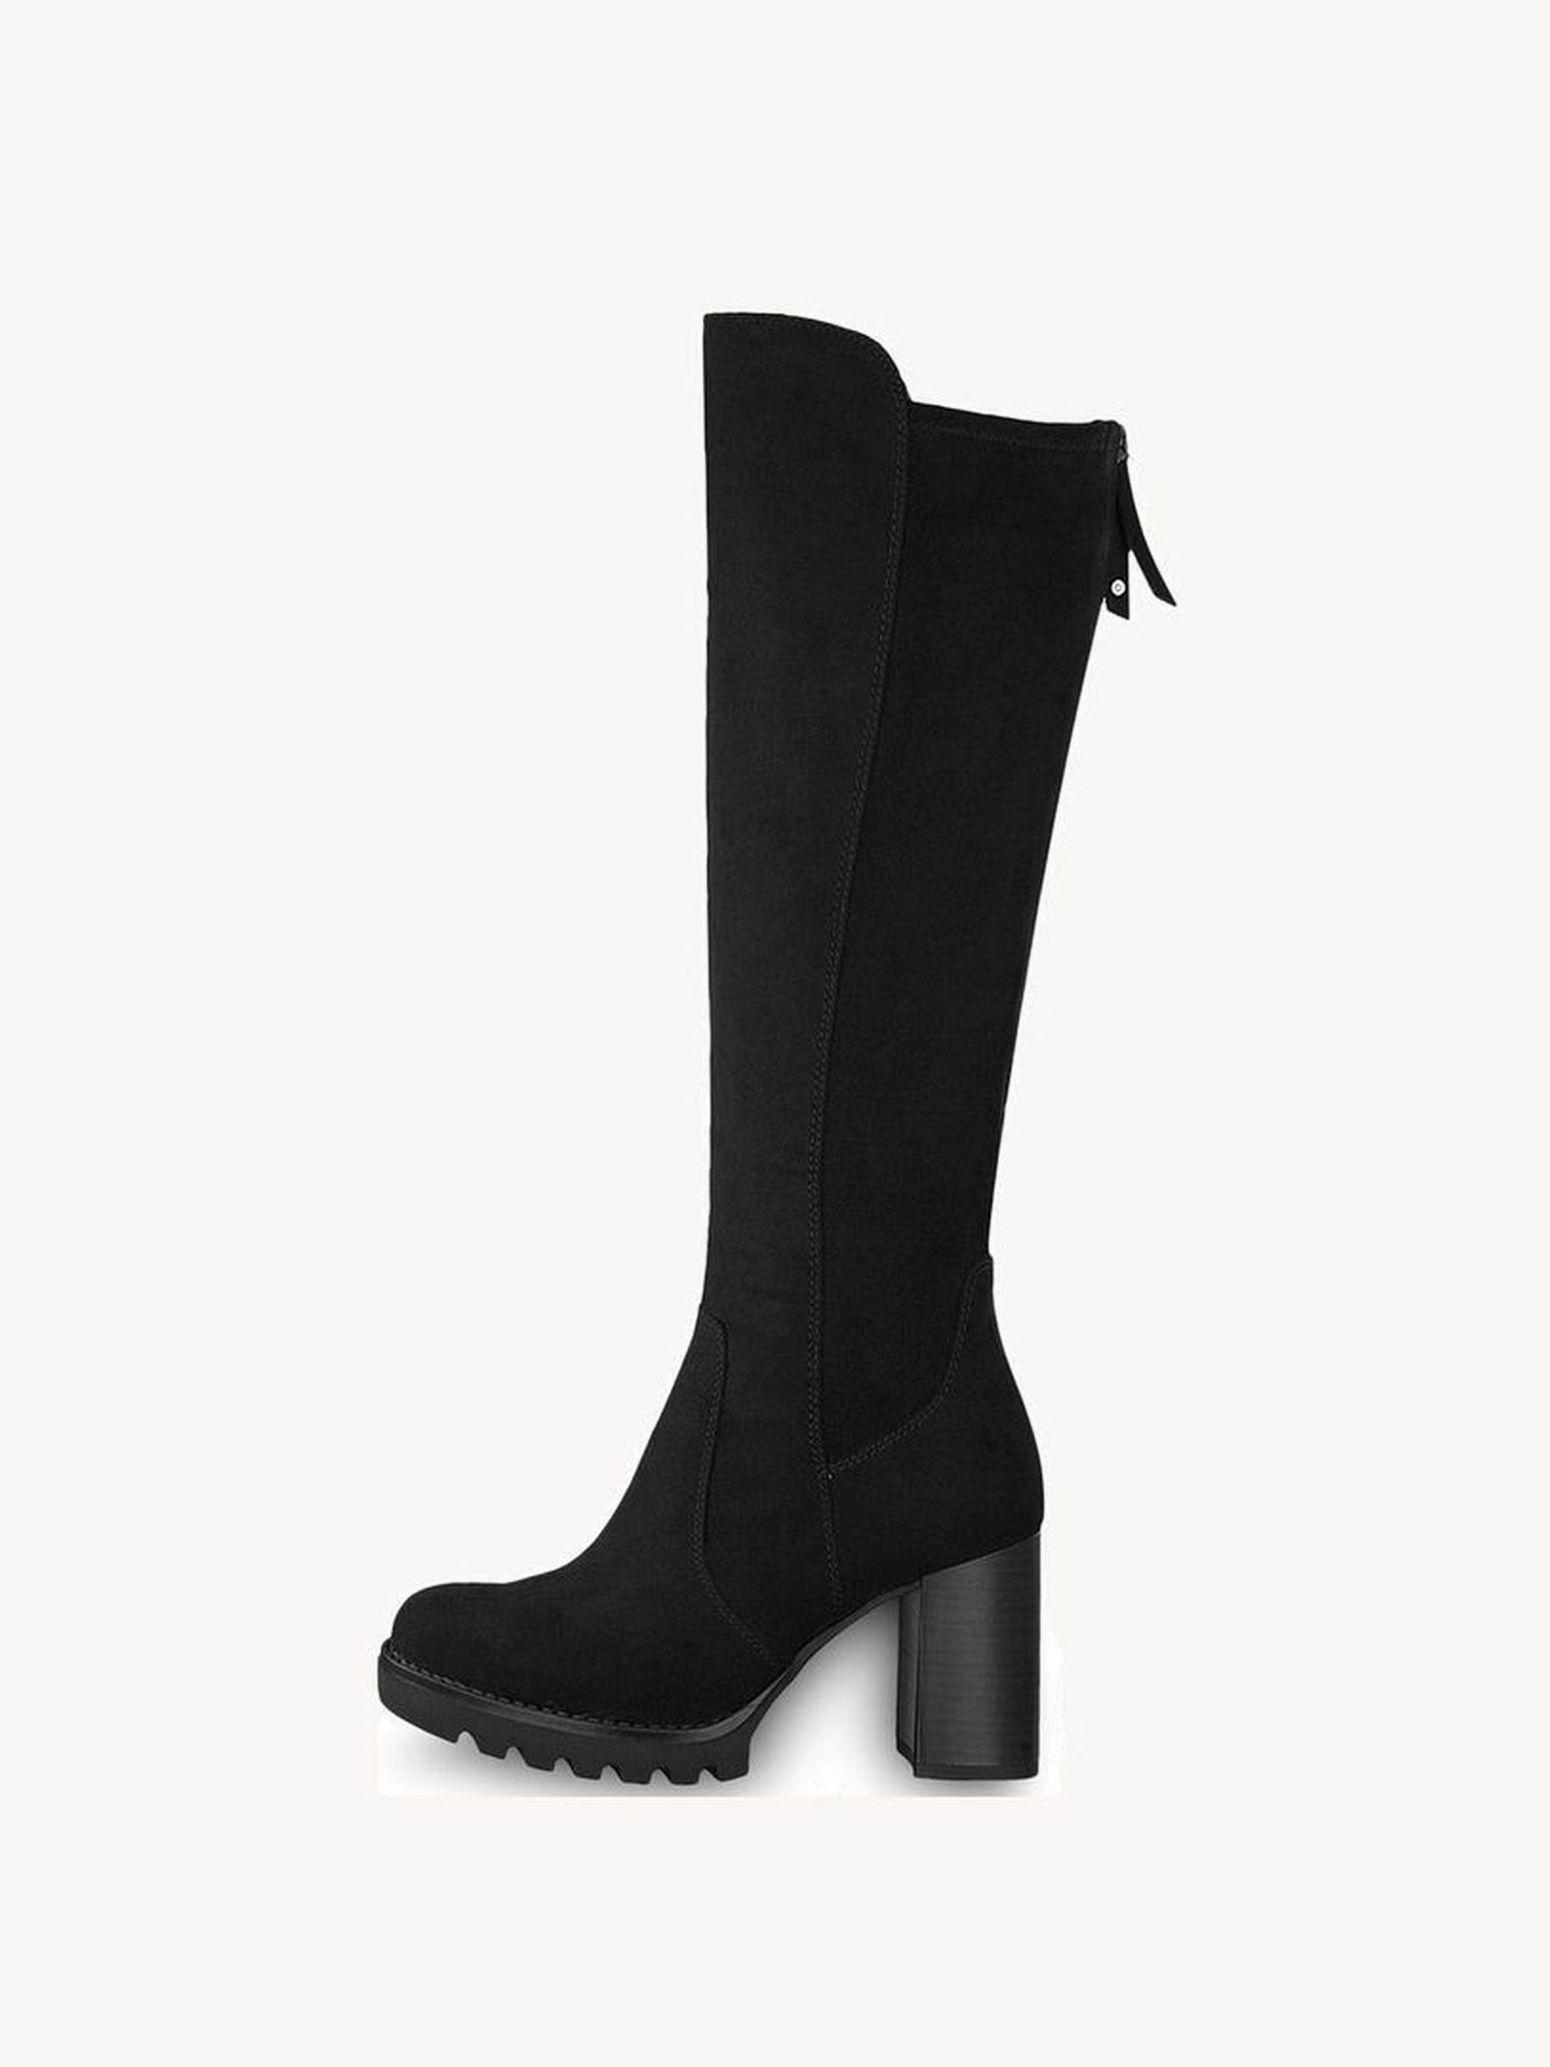 cfd6eb0a9024cf Adelais 1-1-25540-21  Tamaris Stiefel online kaufen!